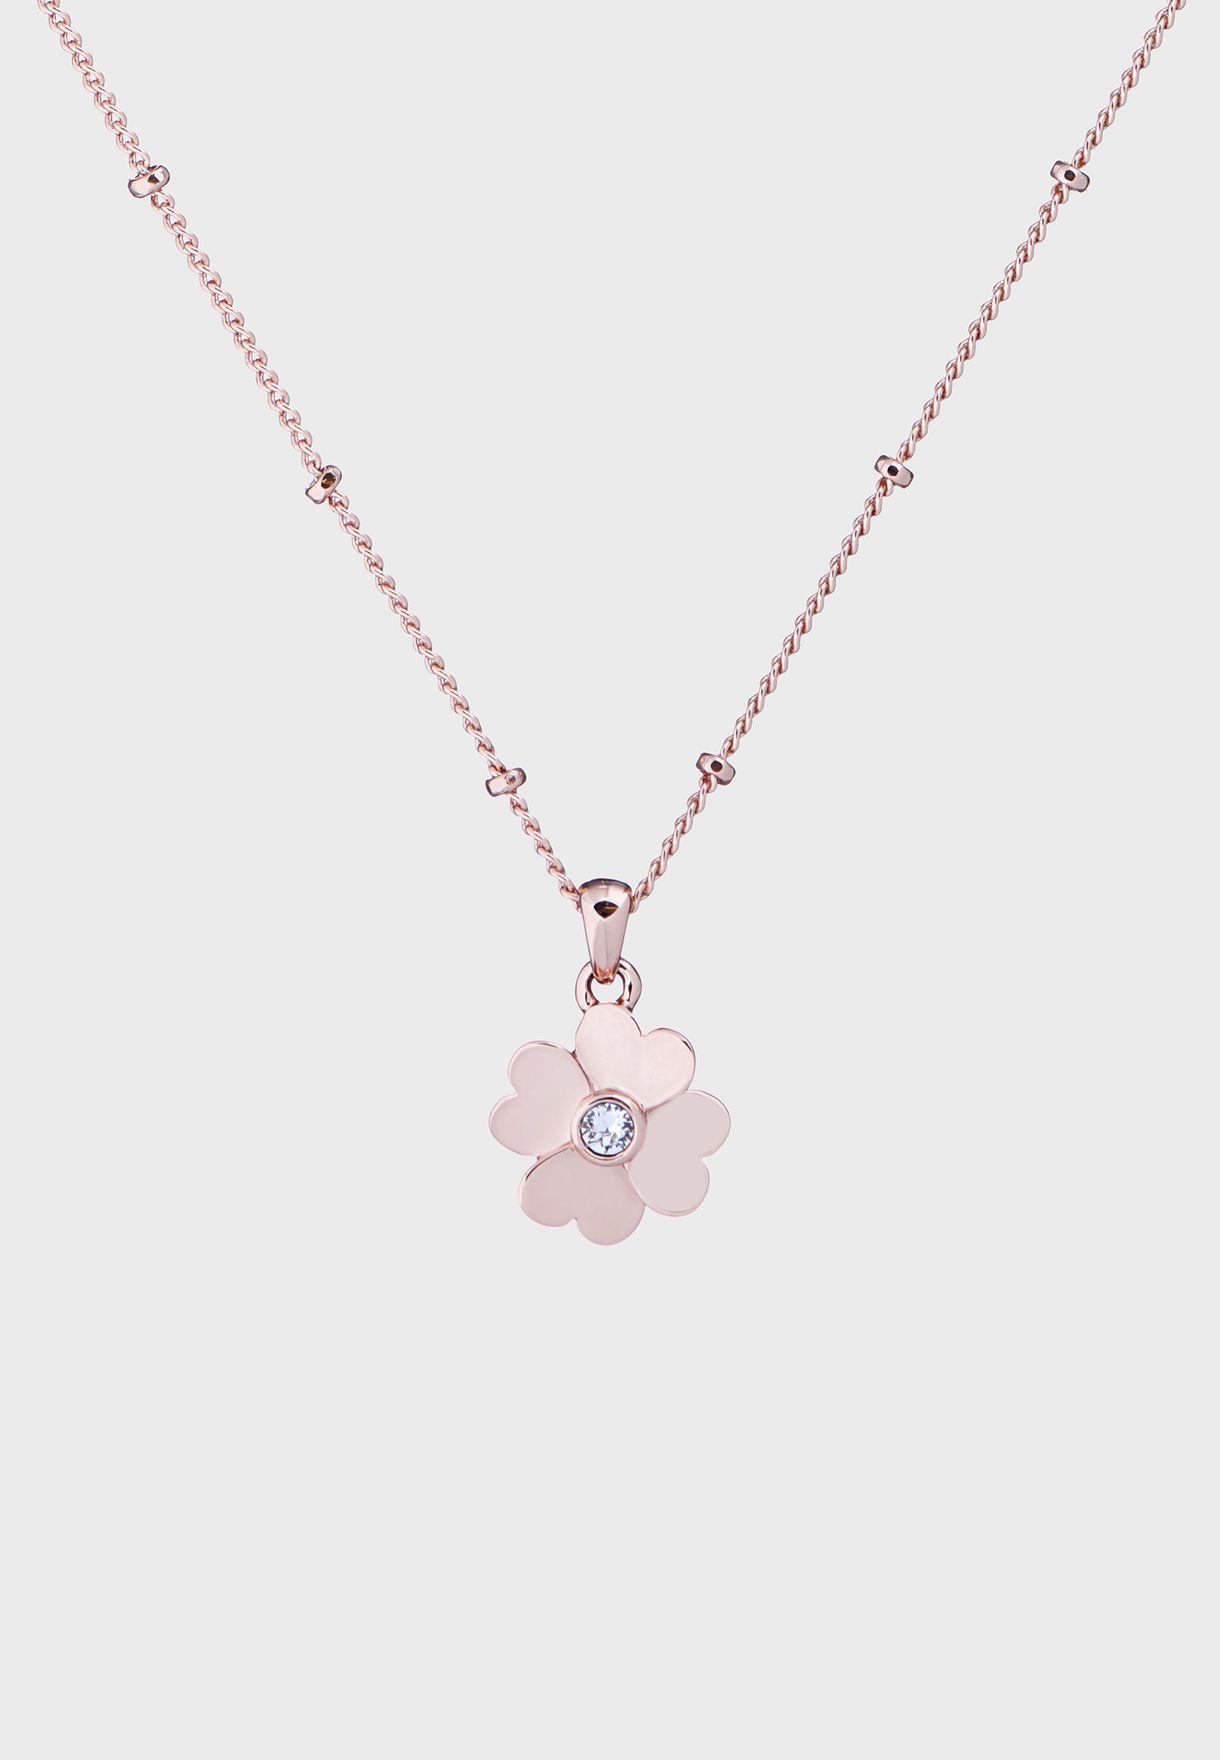 Hamlyi Heart Flower Pendant Necklace